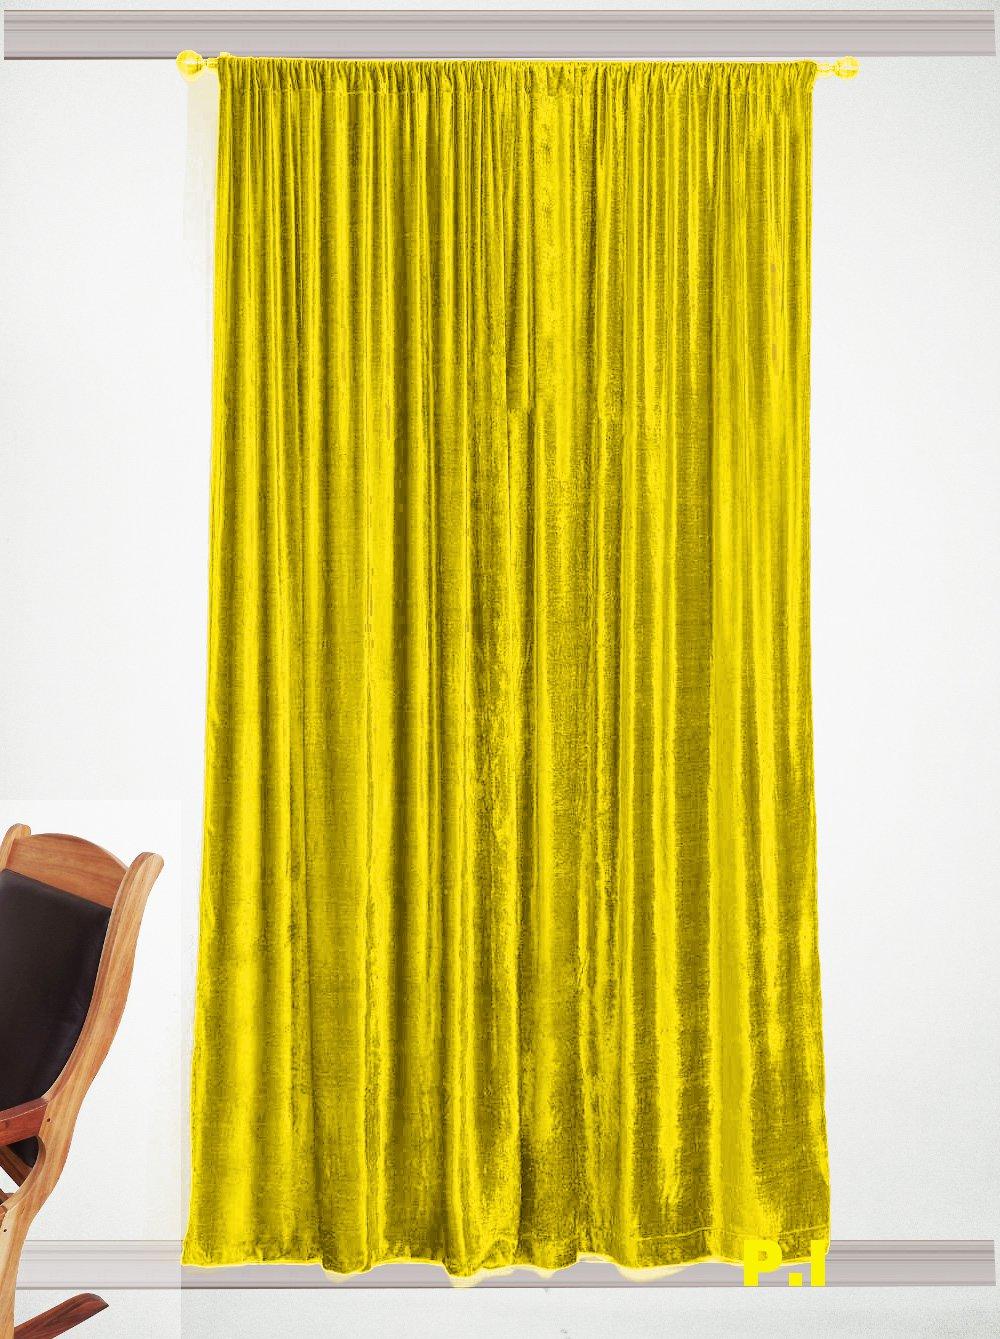 "New Blackout 100% Cotton Velvet Curtain Single Lined Panel 54""W by 108""H - Lemon Grass"